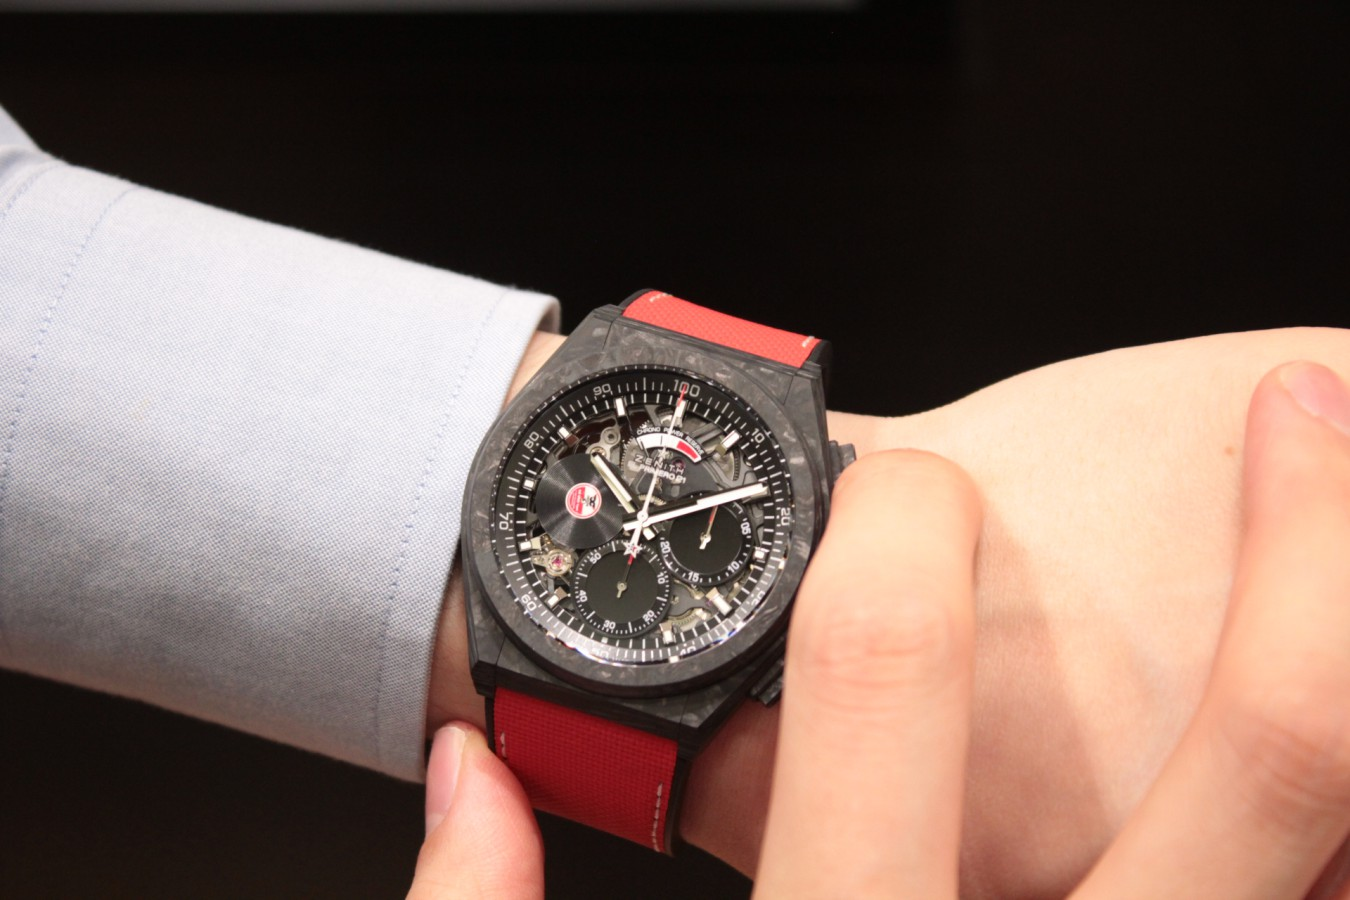 IMG_5907 赤と黒のコントラストがカッコ良い!?世界200本限定のスペシャルモデル「デファイ エル・プリメロ21 カール・コックス エディション」 - DEFY